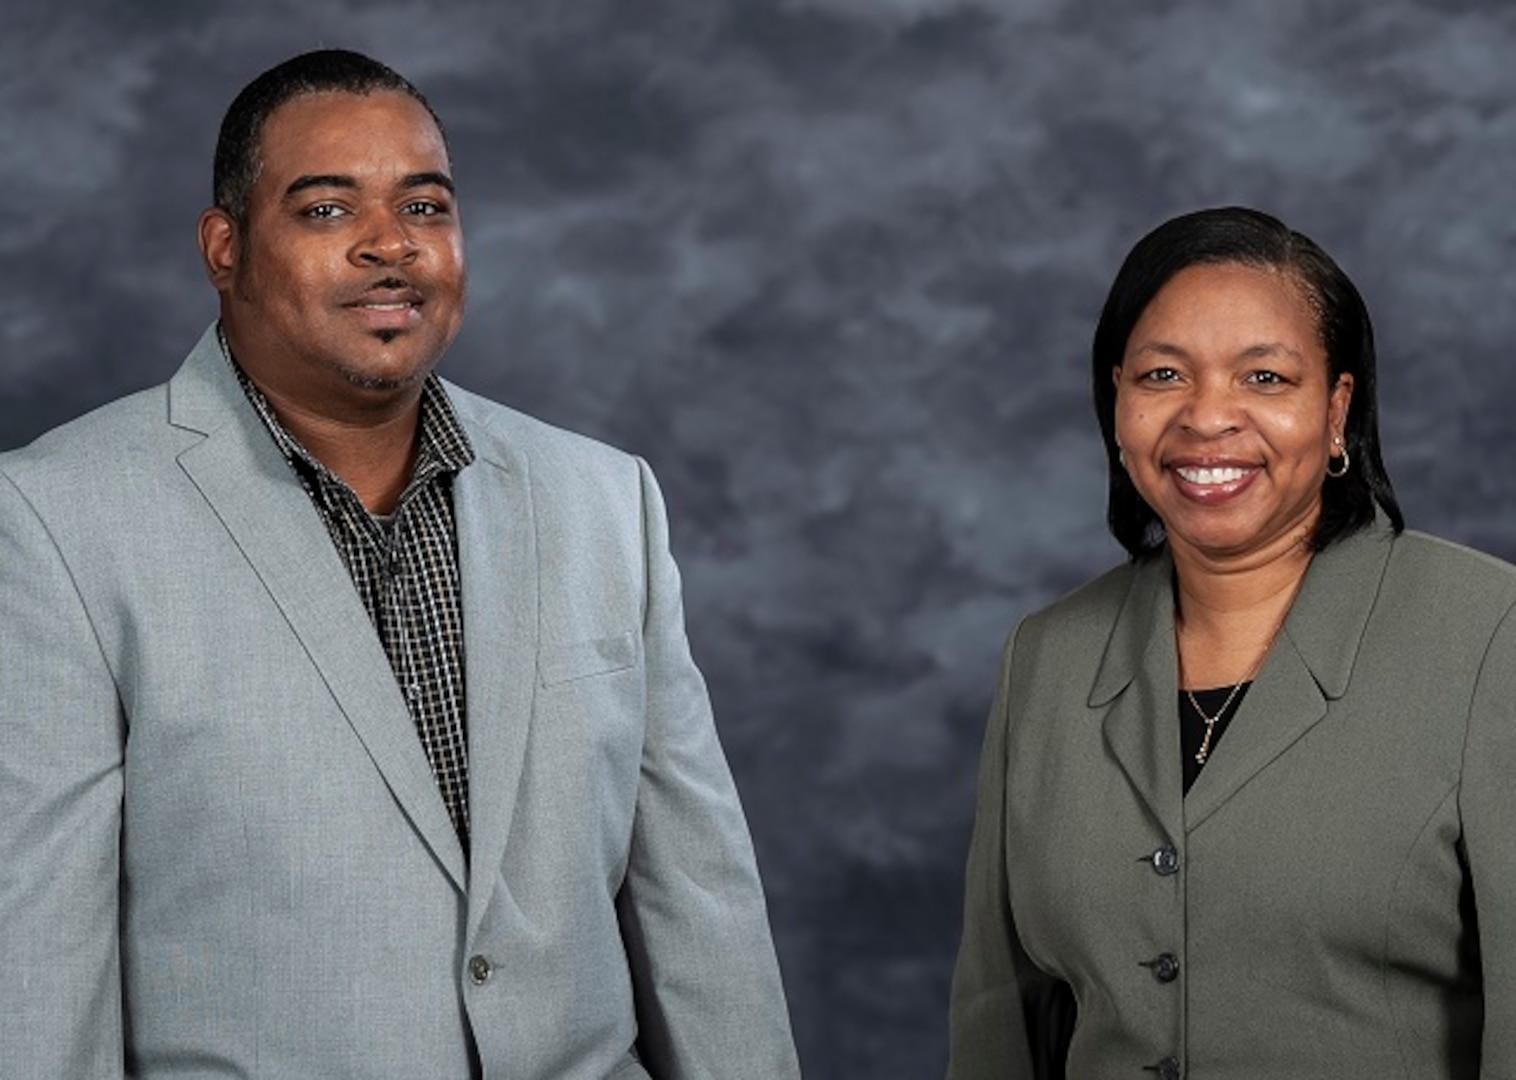 DLA HR Interns Eric Benton and Dianne Simmons